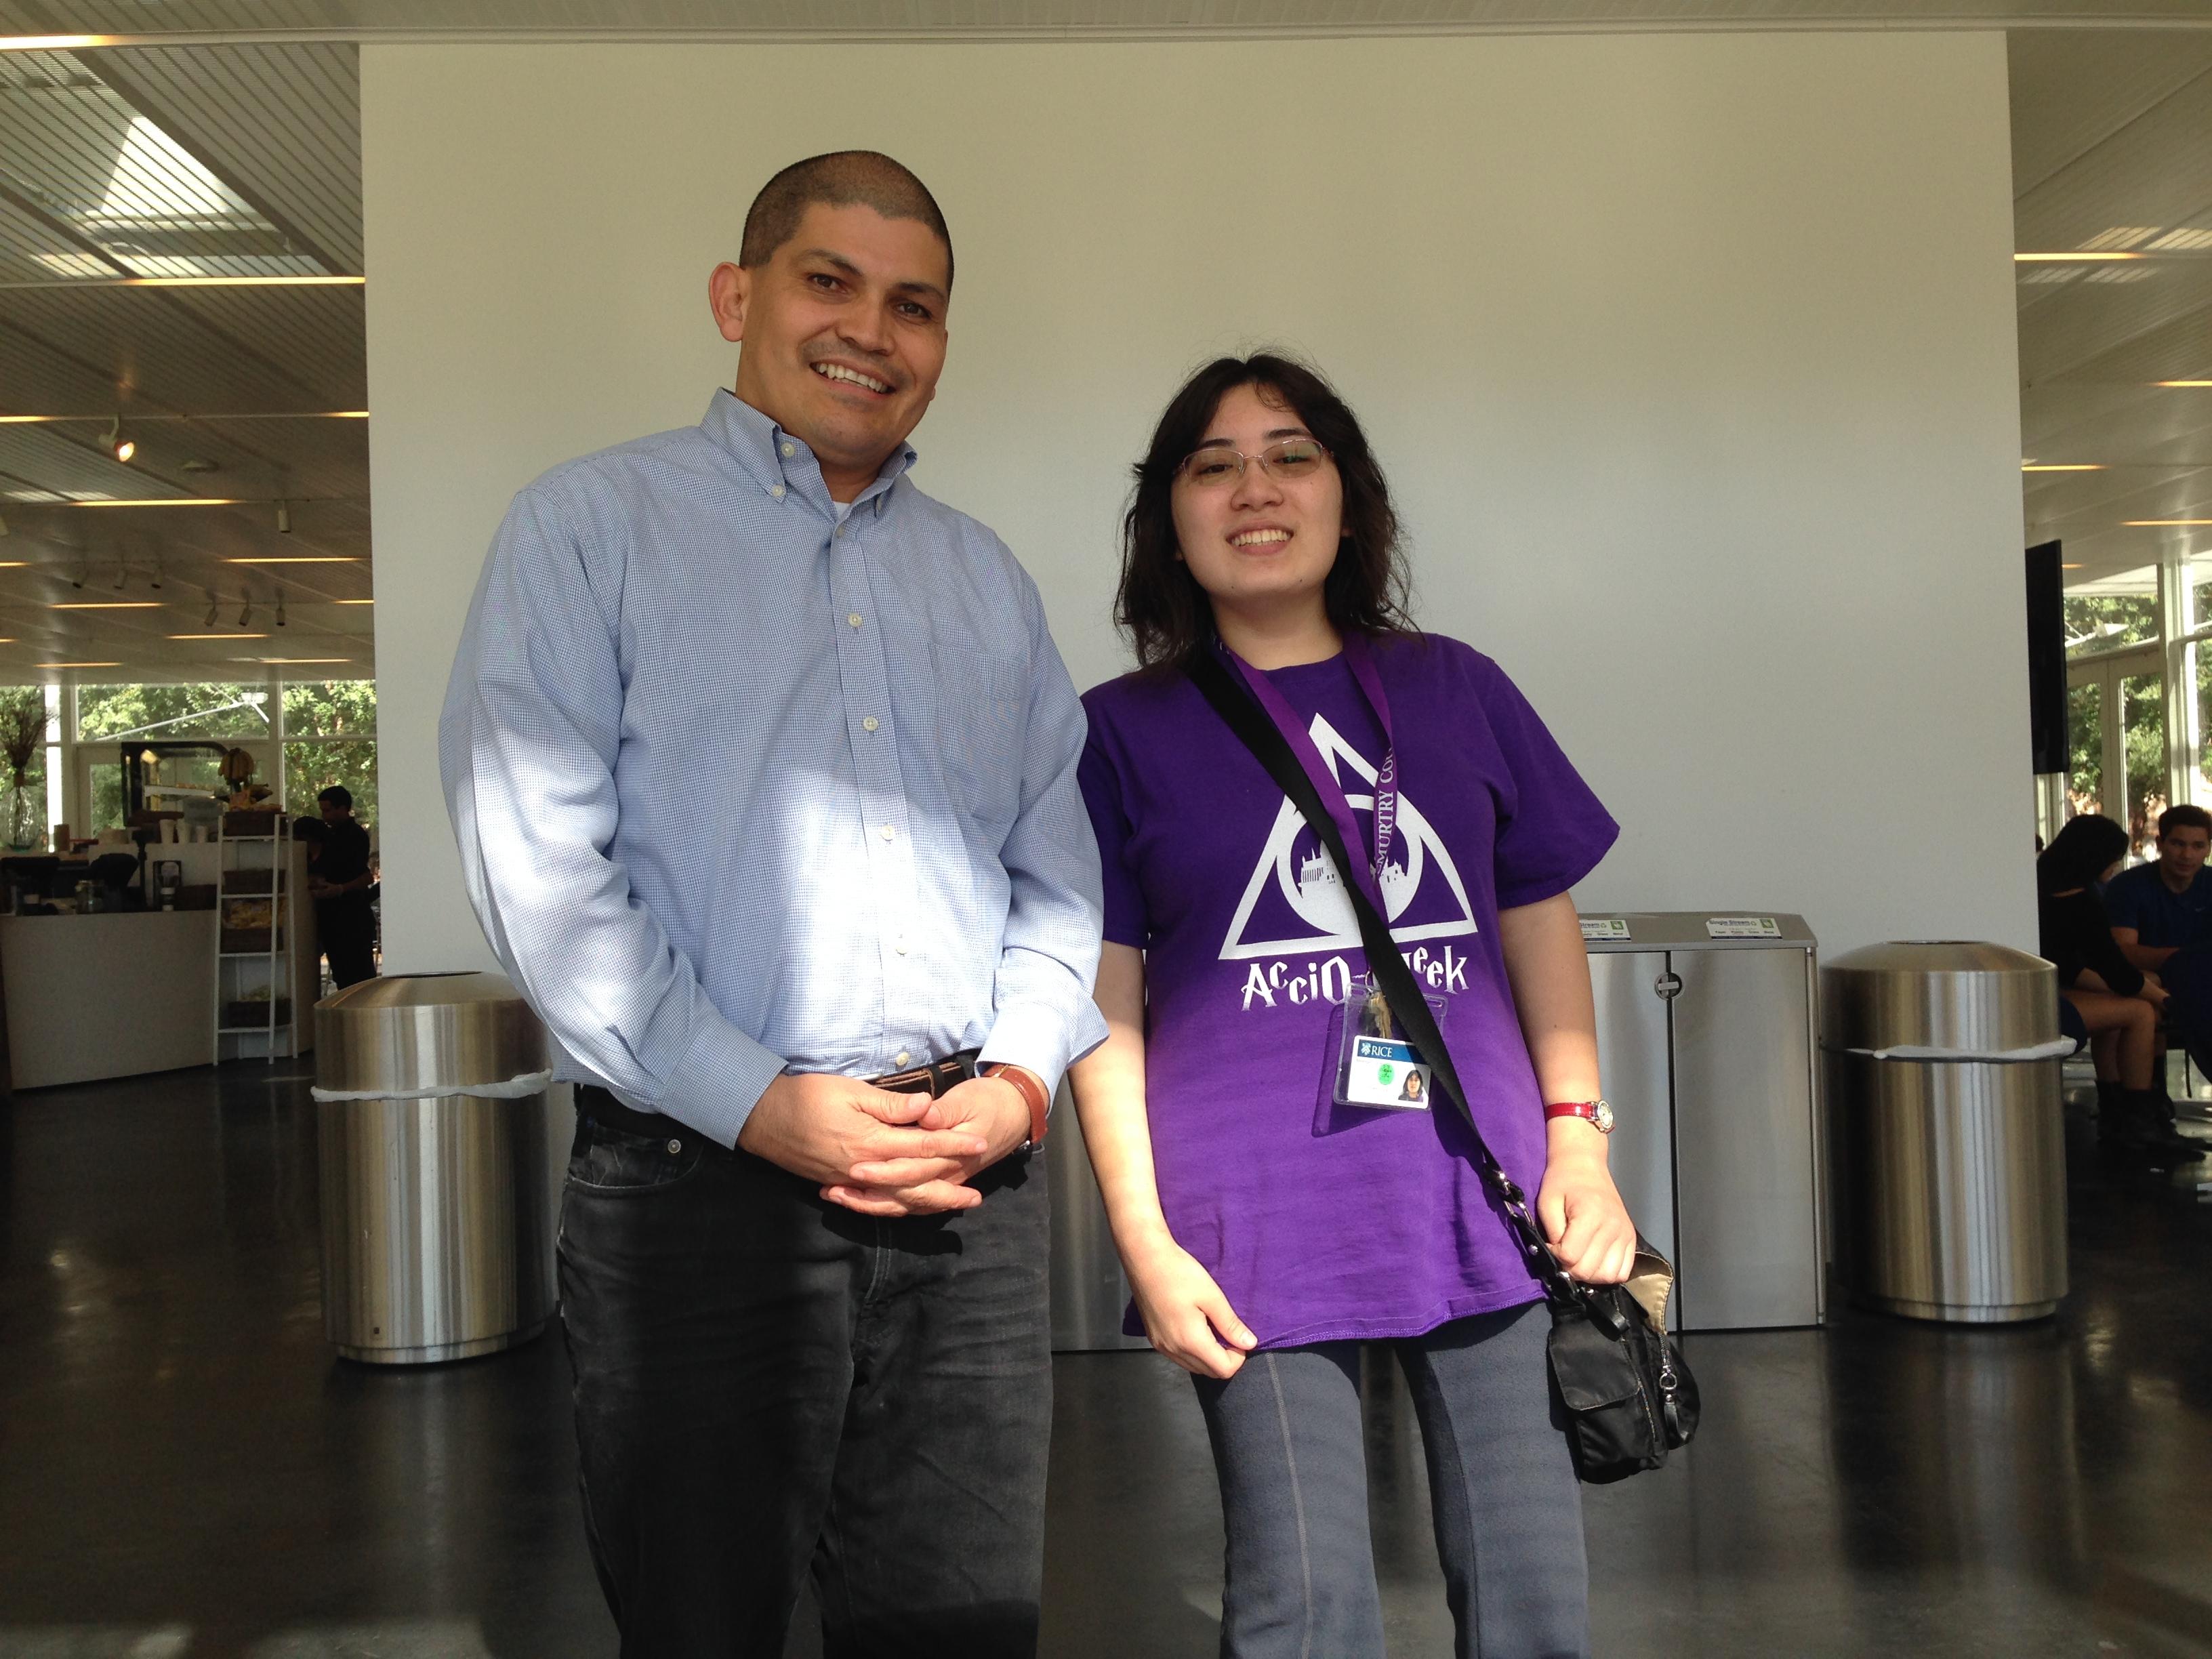 Dr Carlos Monroy and Melinda Crane